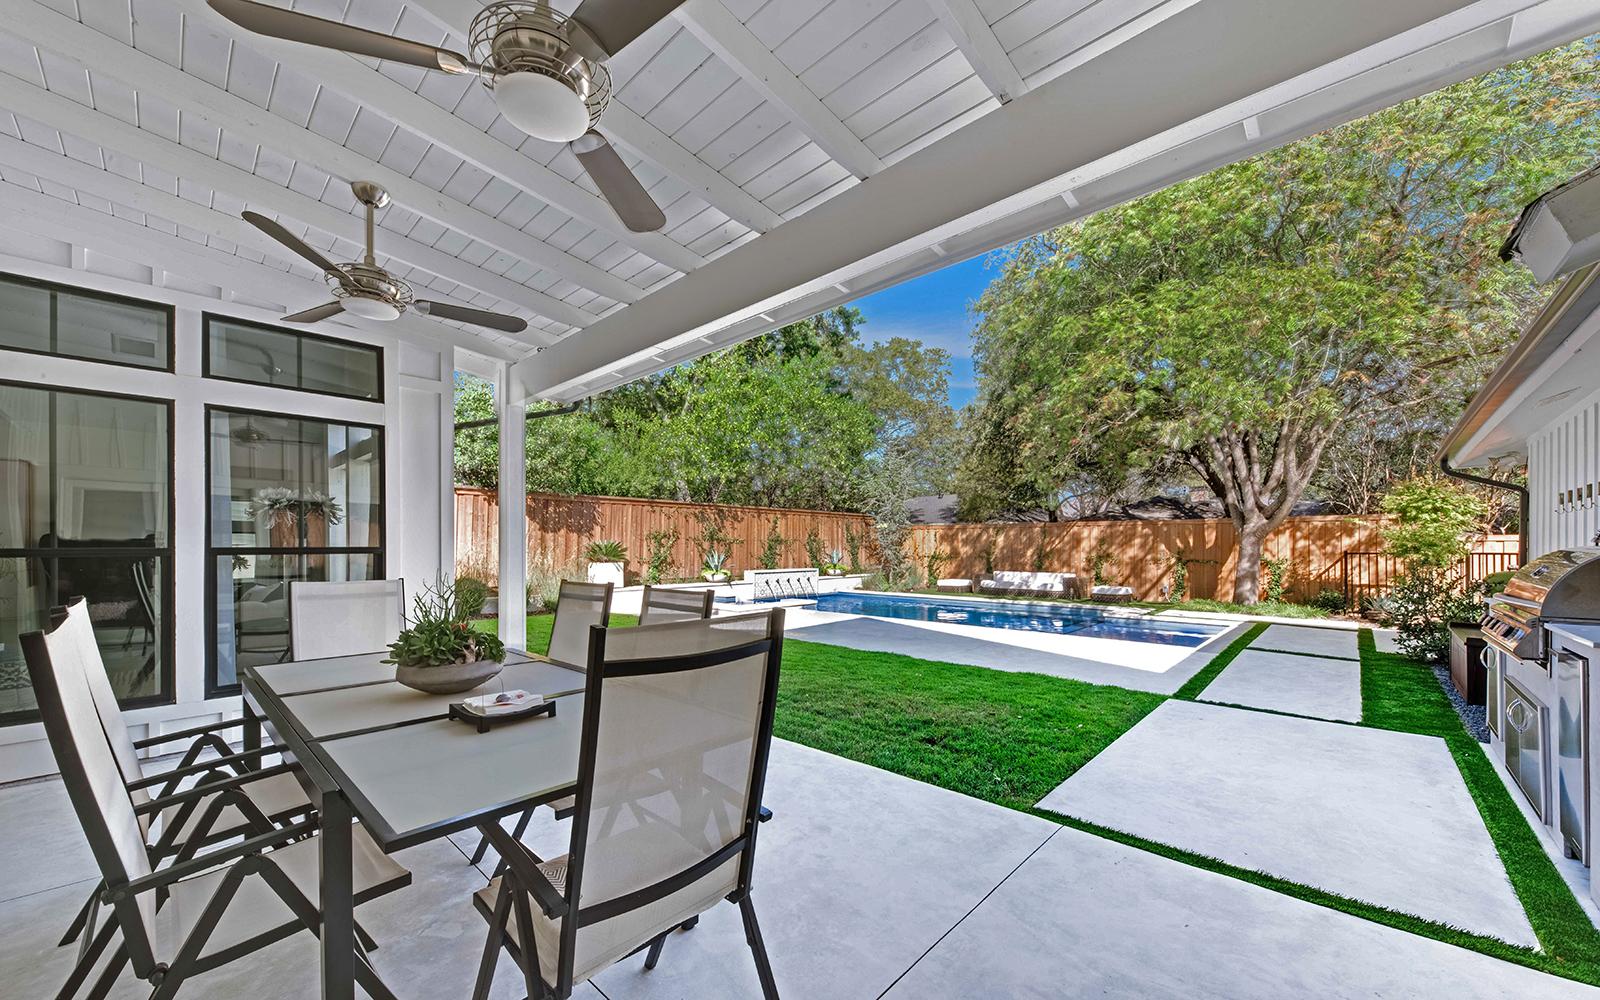 lakewood-rear-modern-porch.jpg